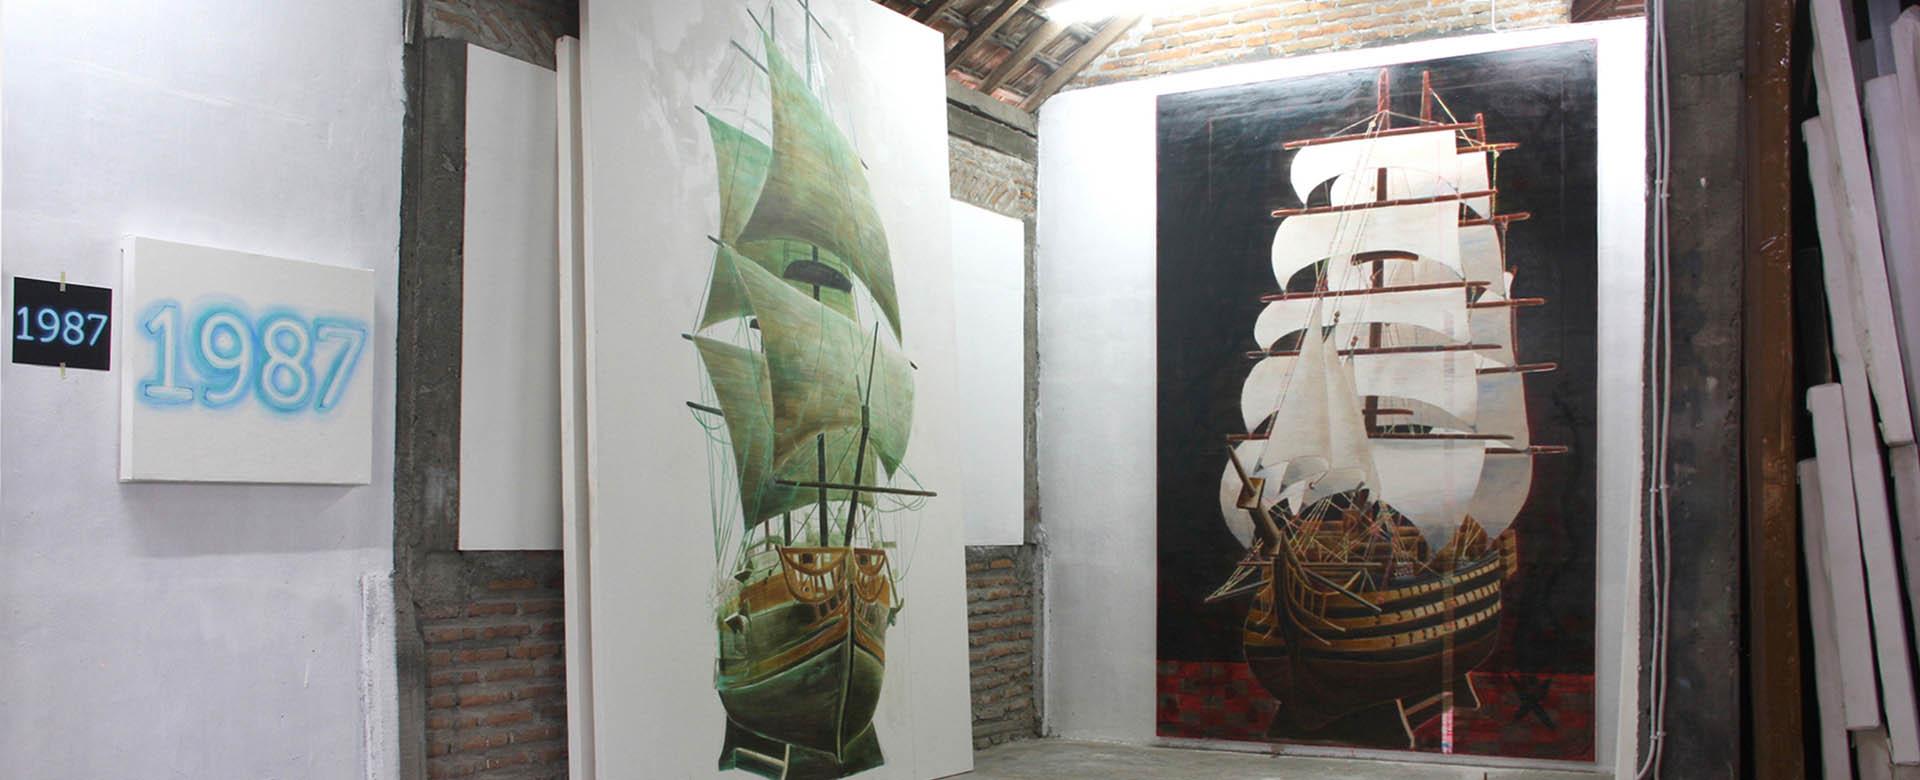 fendry-ekel-studio